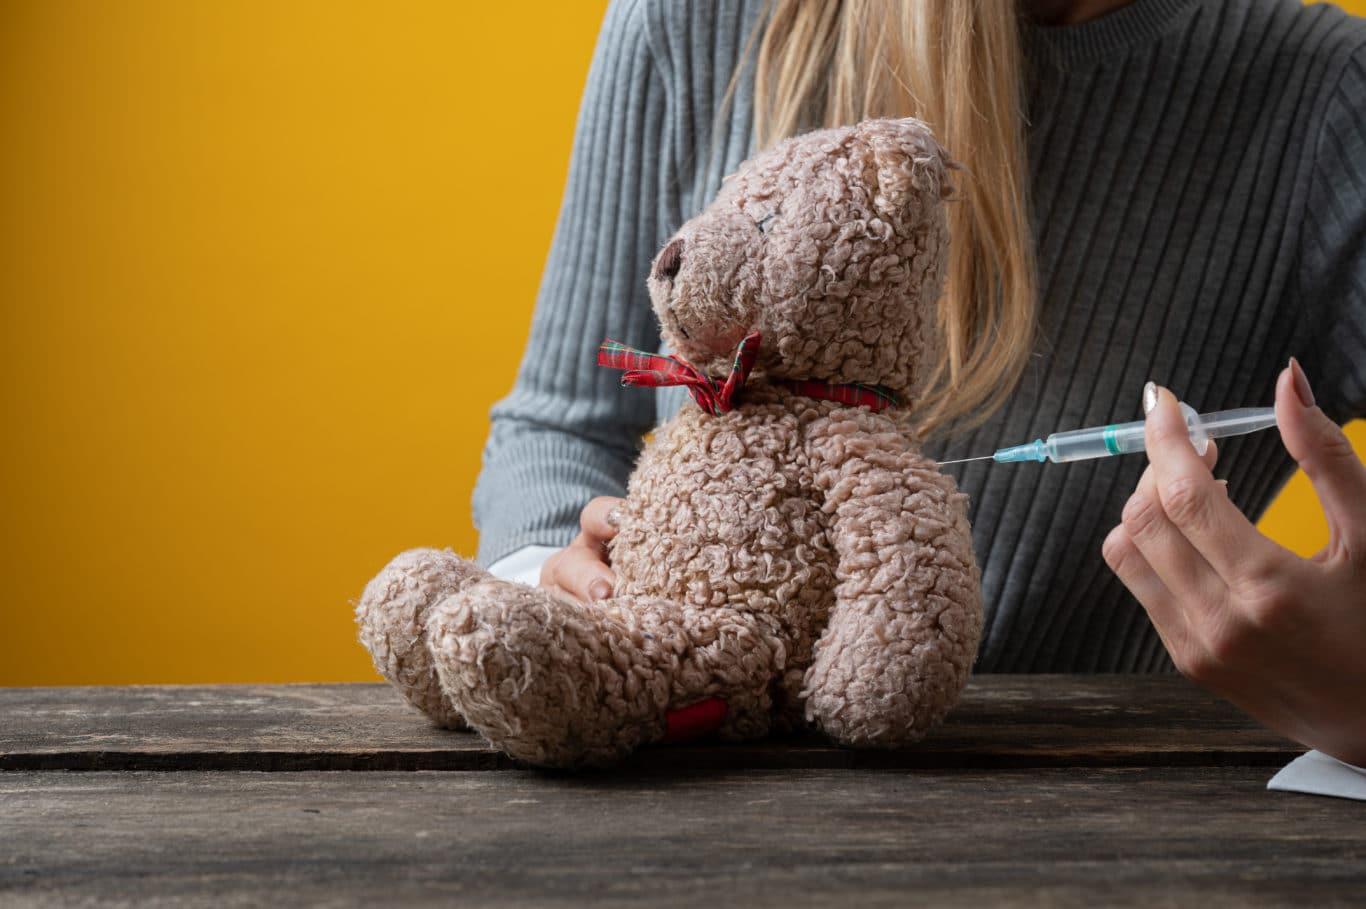 Impfung Kinder Teddy